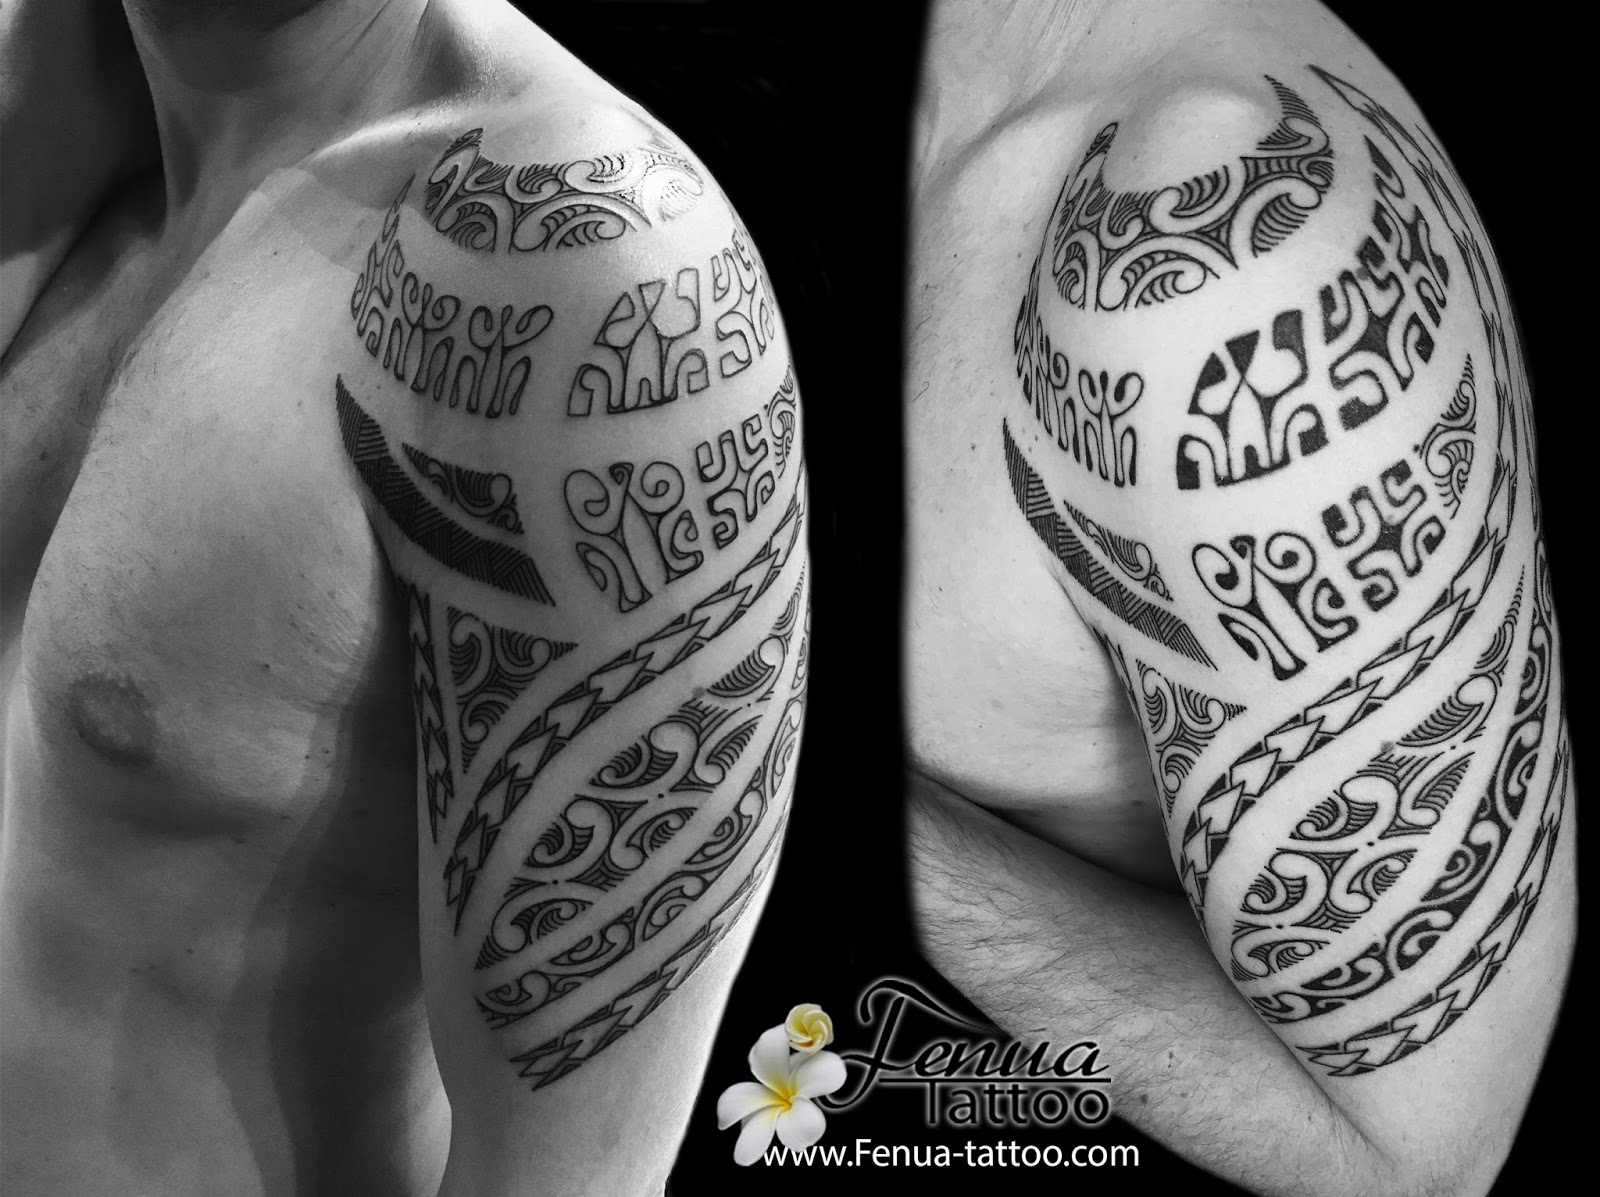 Tahiti tattoo sp cialiste du tatouage polynesien dot work et recouvrement tatouage polyn sien - Tattoo maorie bras ...